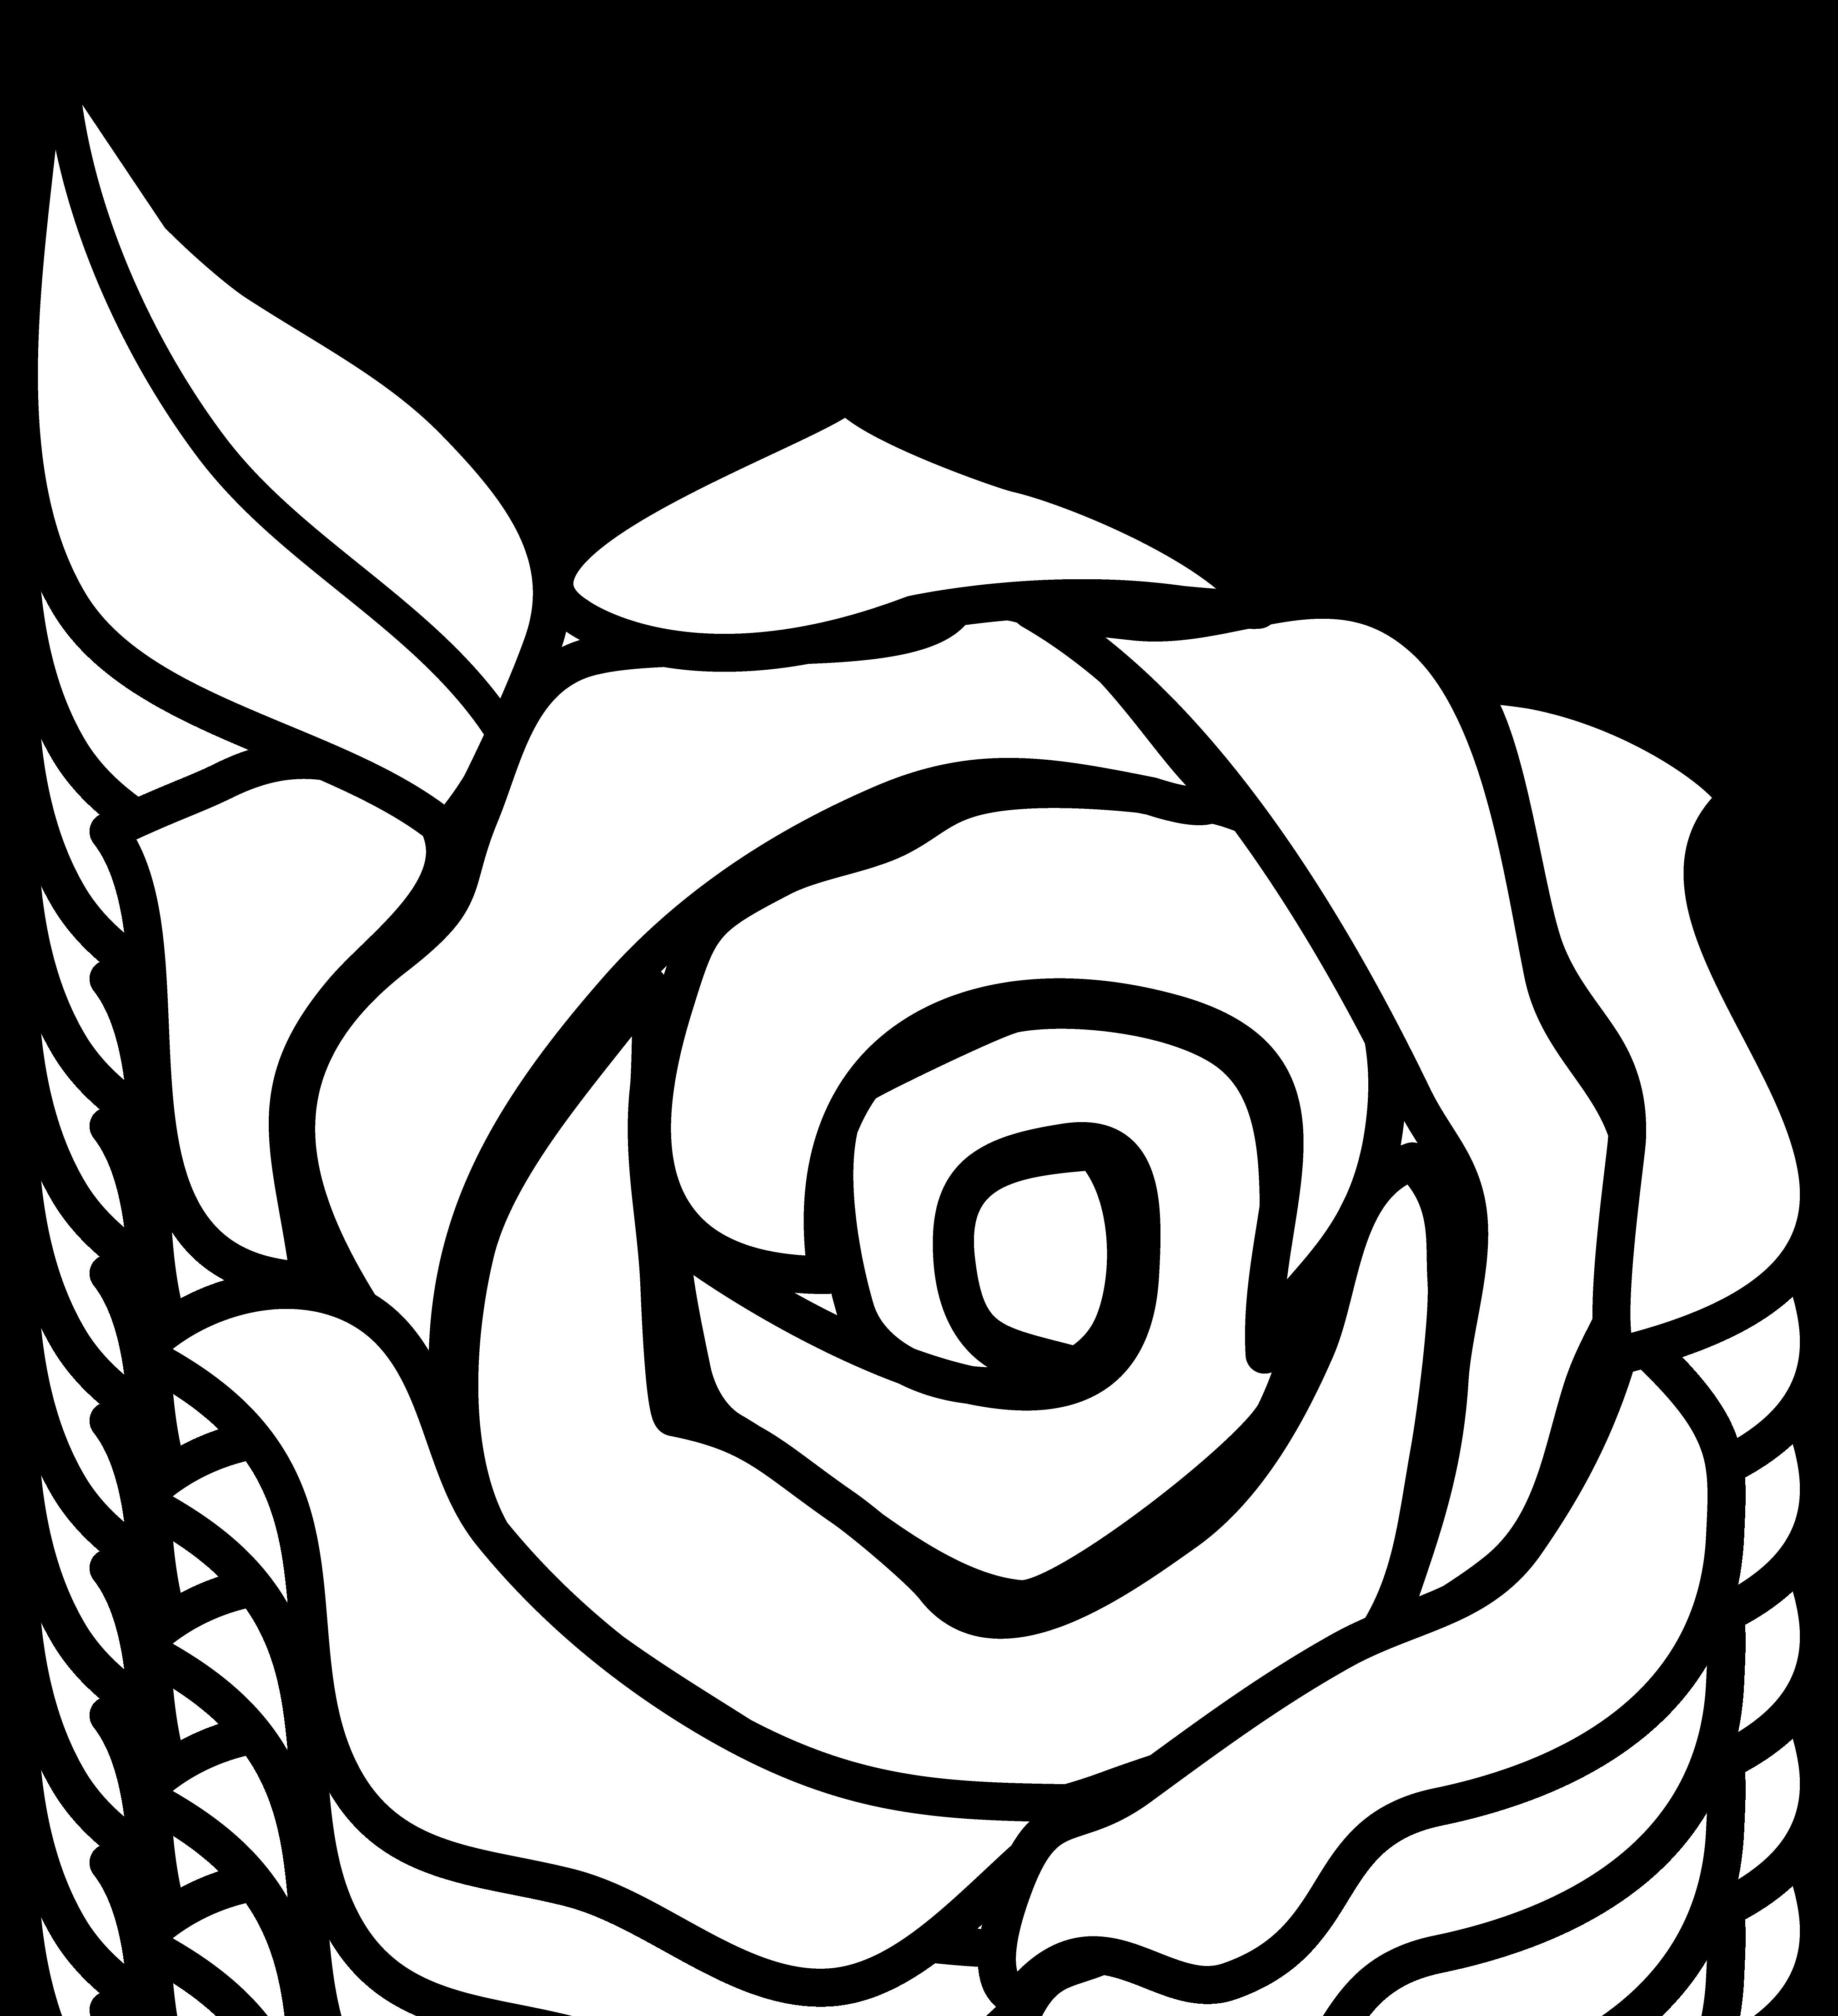 Black And White Rose Border Clip Art Clipart Panda Free Clipart.